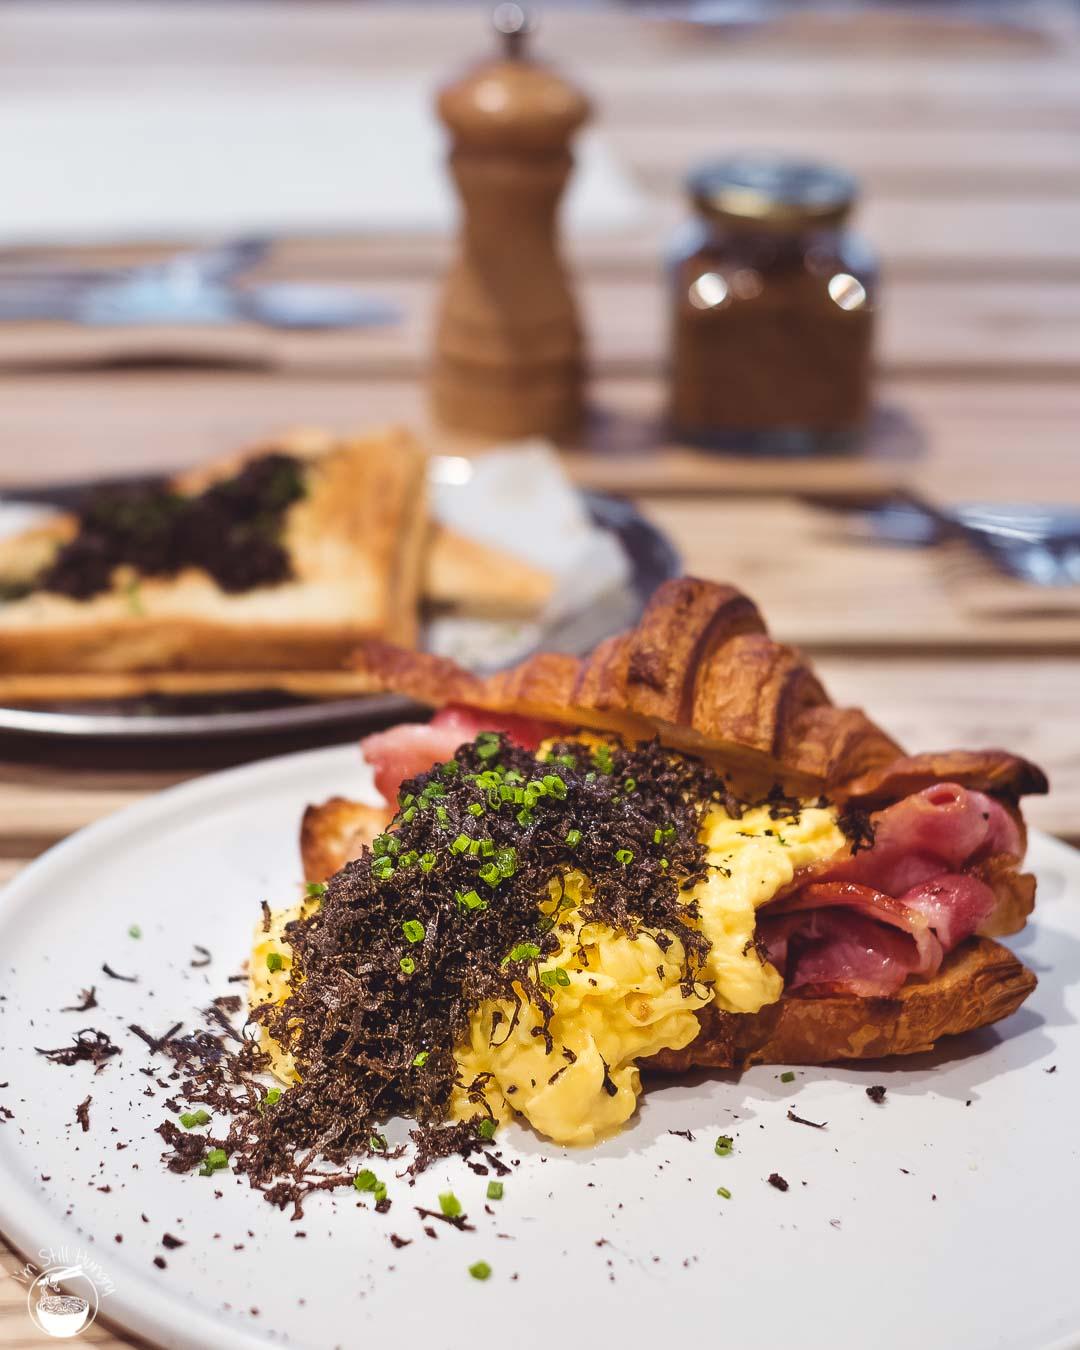 Devon Cafe Barangaroo Croissant royale: butter croissant, scrambled eggs, bacon, fresh WA truffle